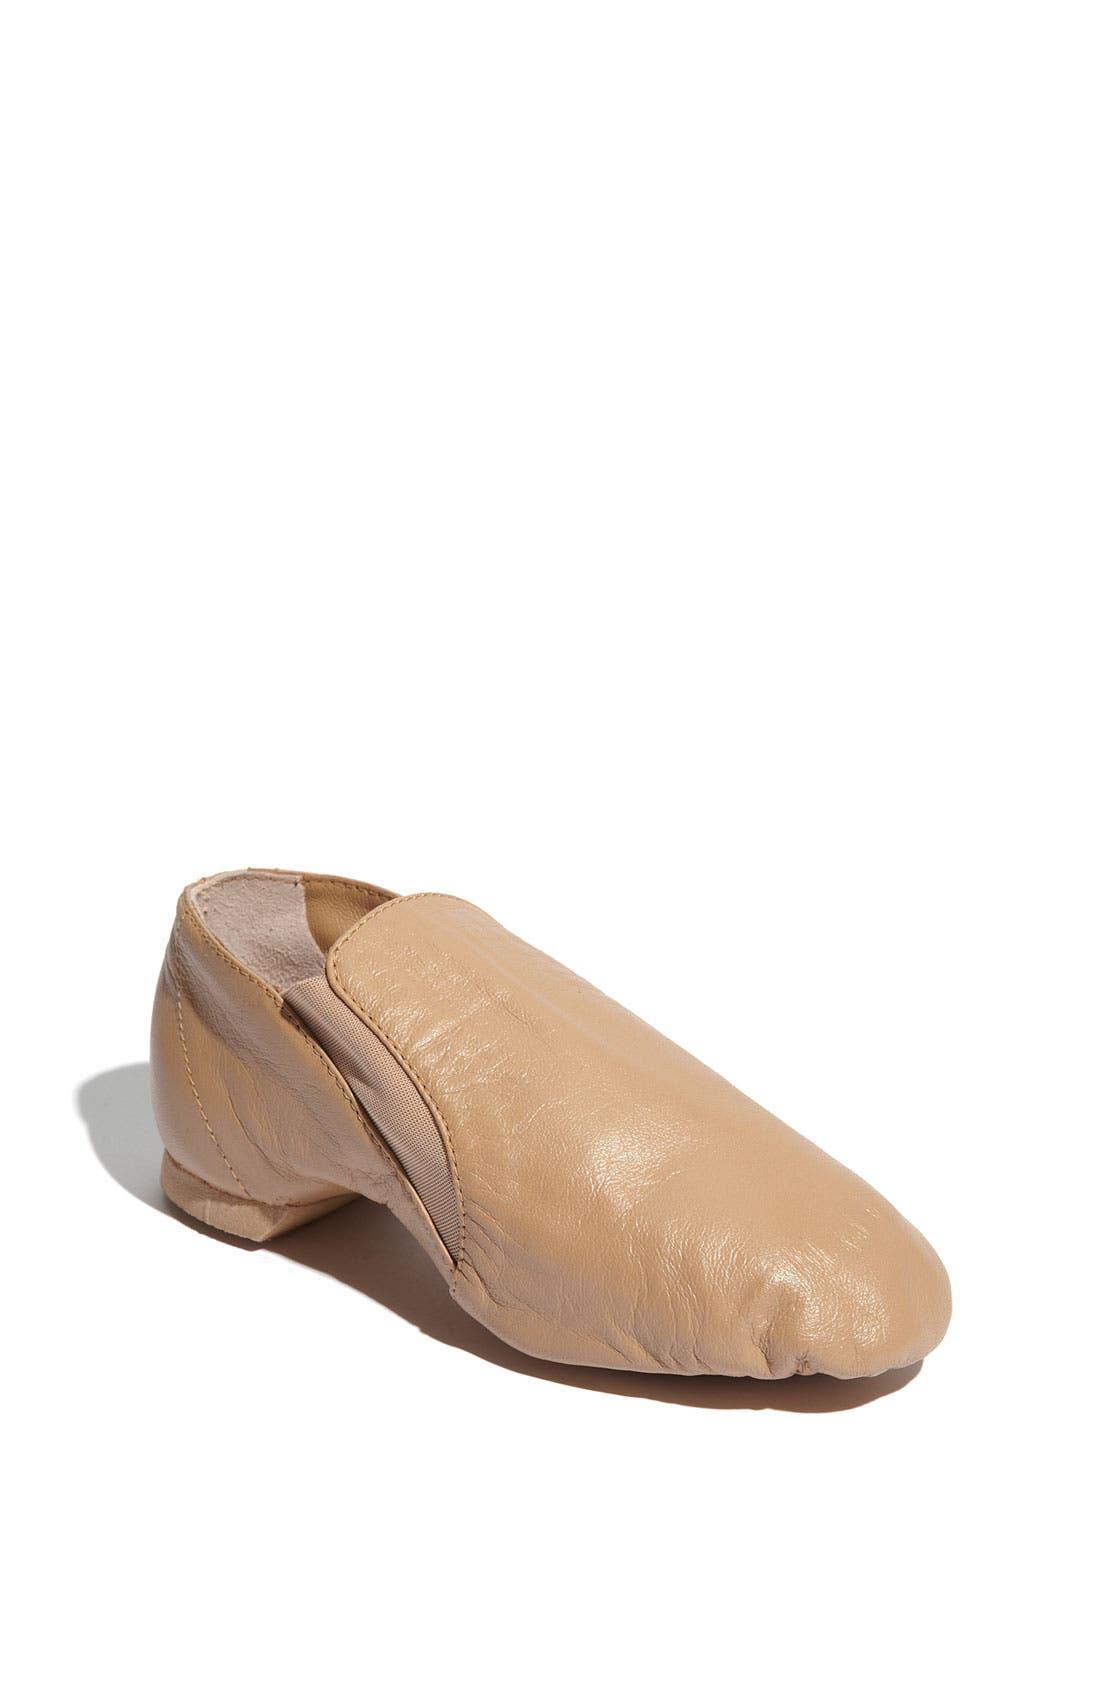 Alternate Image 1 Selected - Bloch 'Elasta Bootie' Jazz Shoe (Toddler, Little Kid & Big Kid)